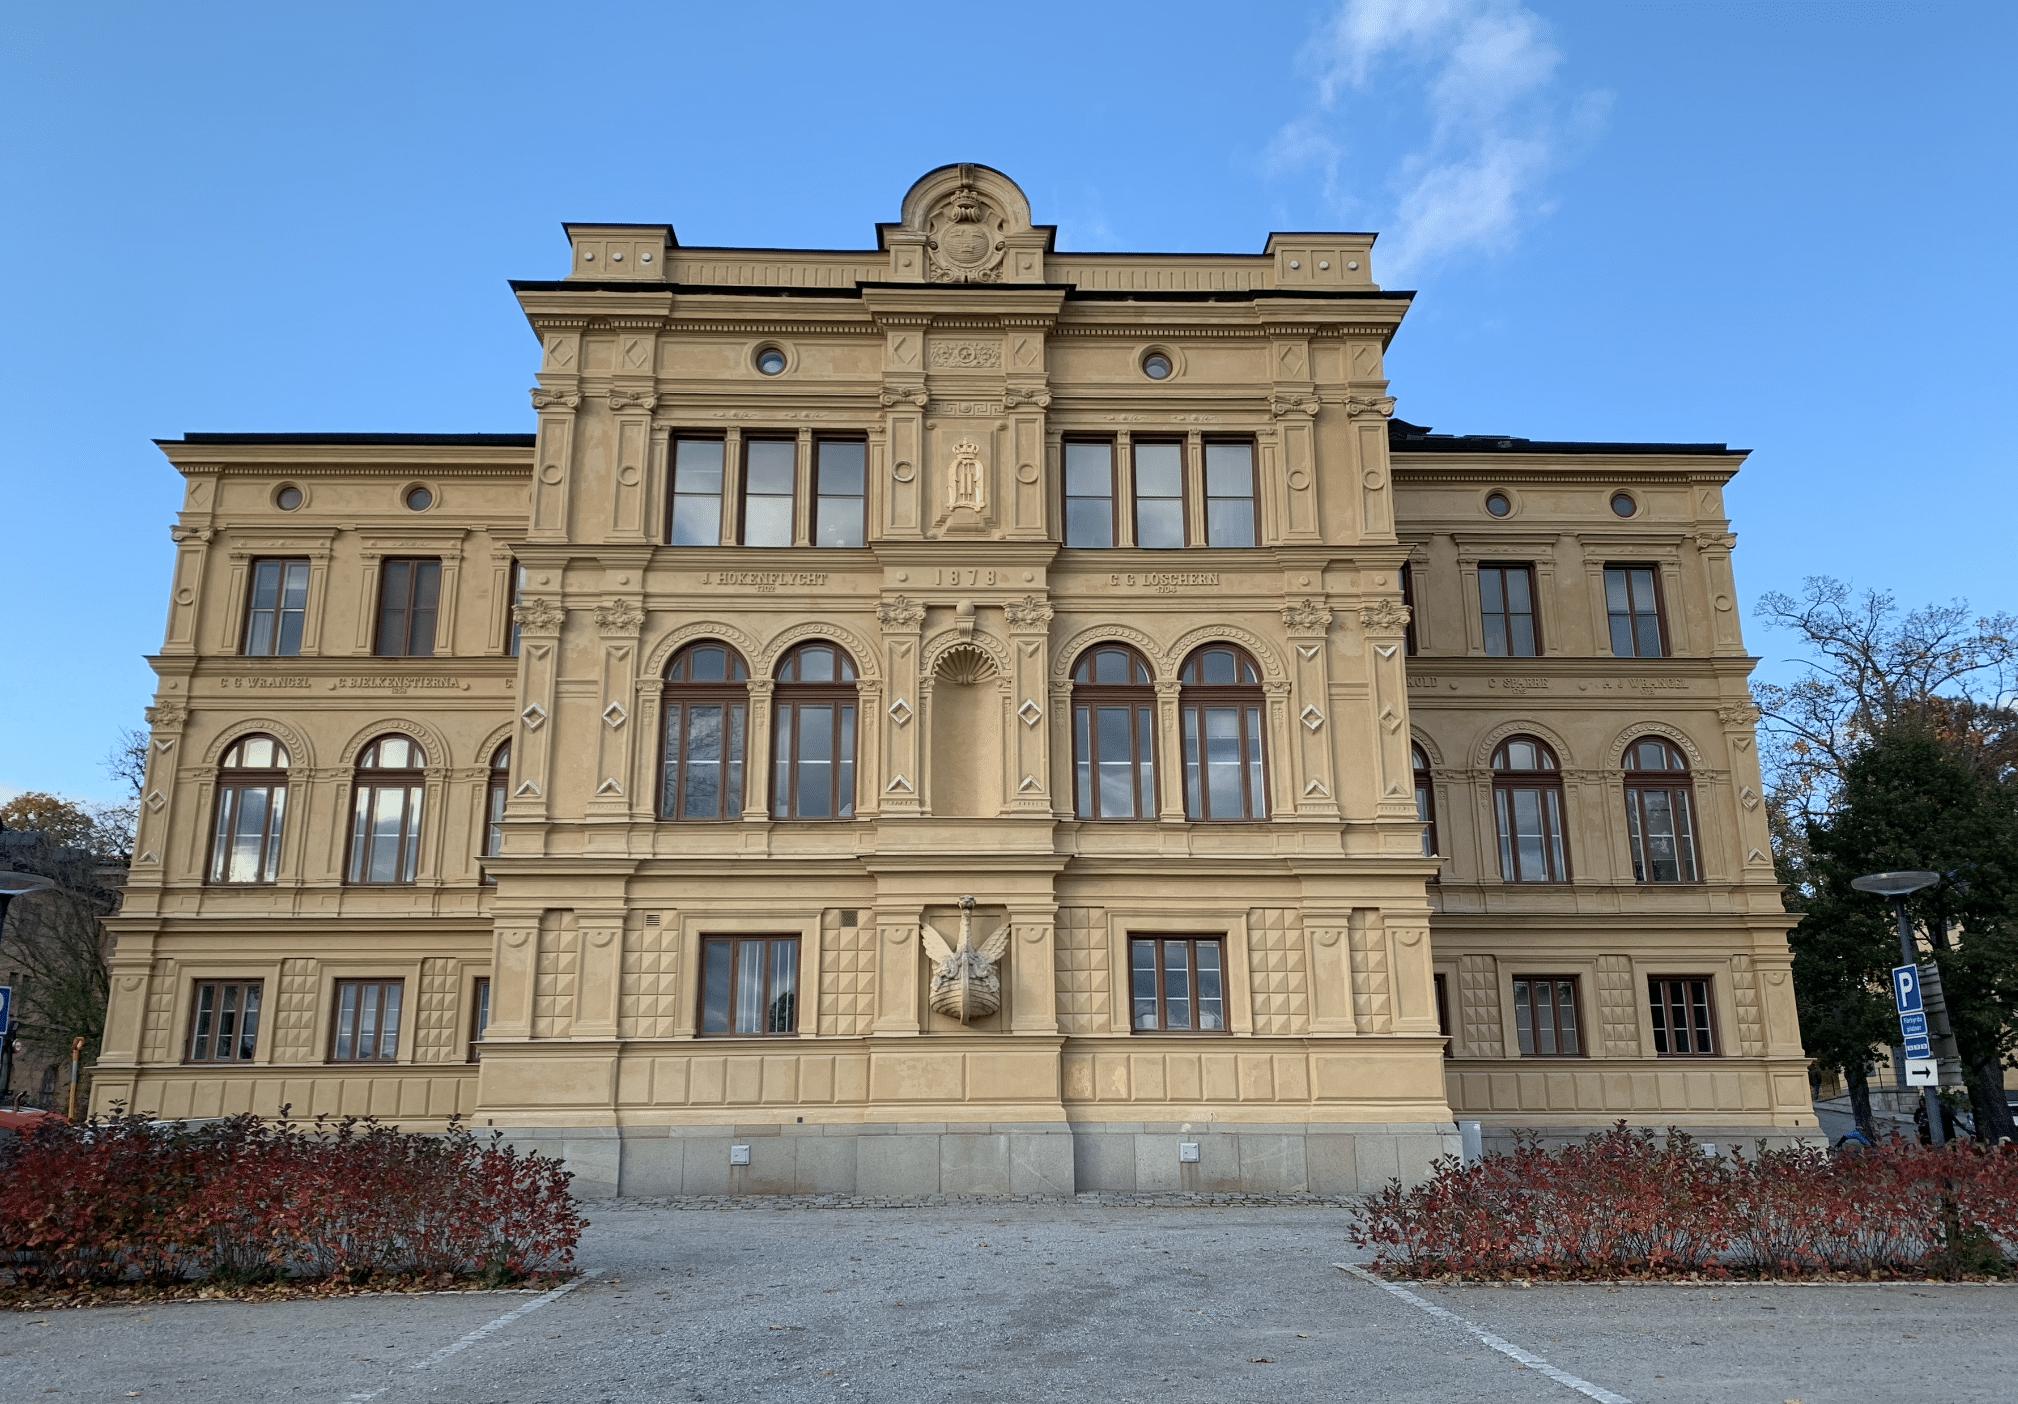 l'institut de recherche nordregio a skeppsholmen